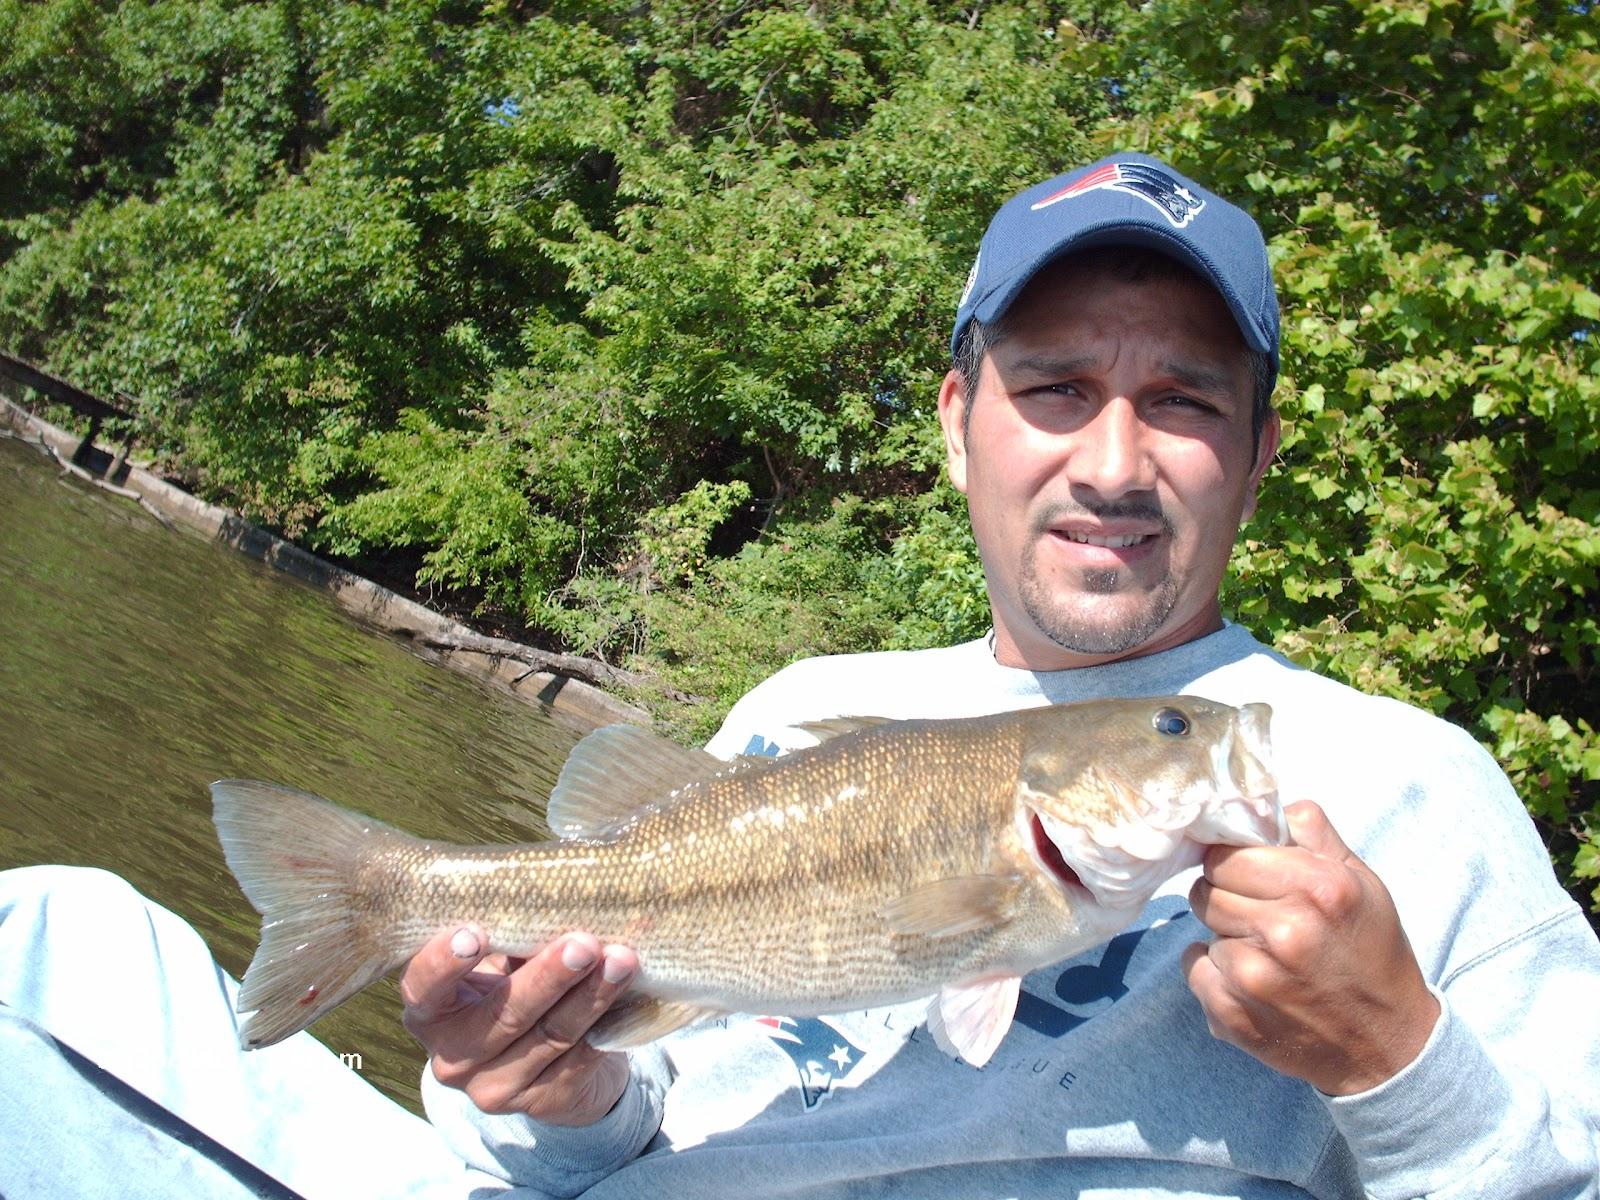 Kayakweiss fishing fishing lake weiss and hunting down for Bass fishing lakes near me